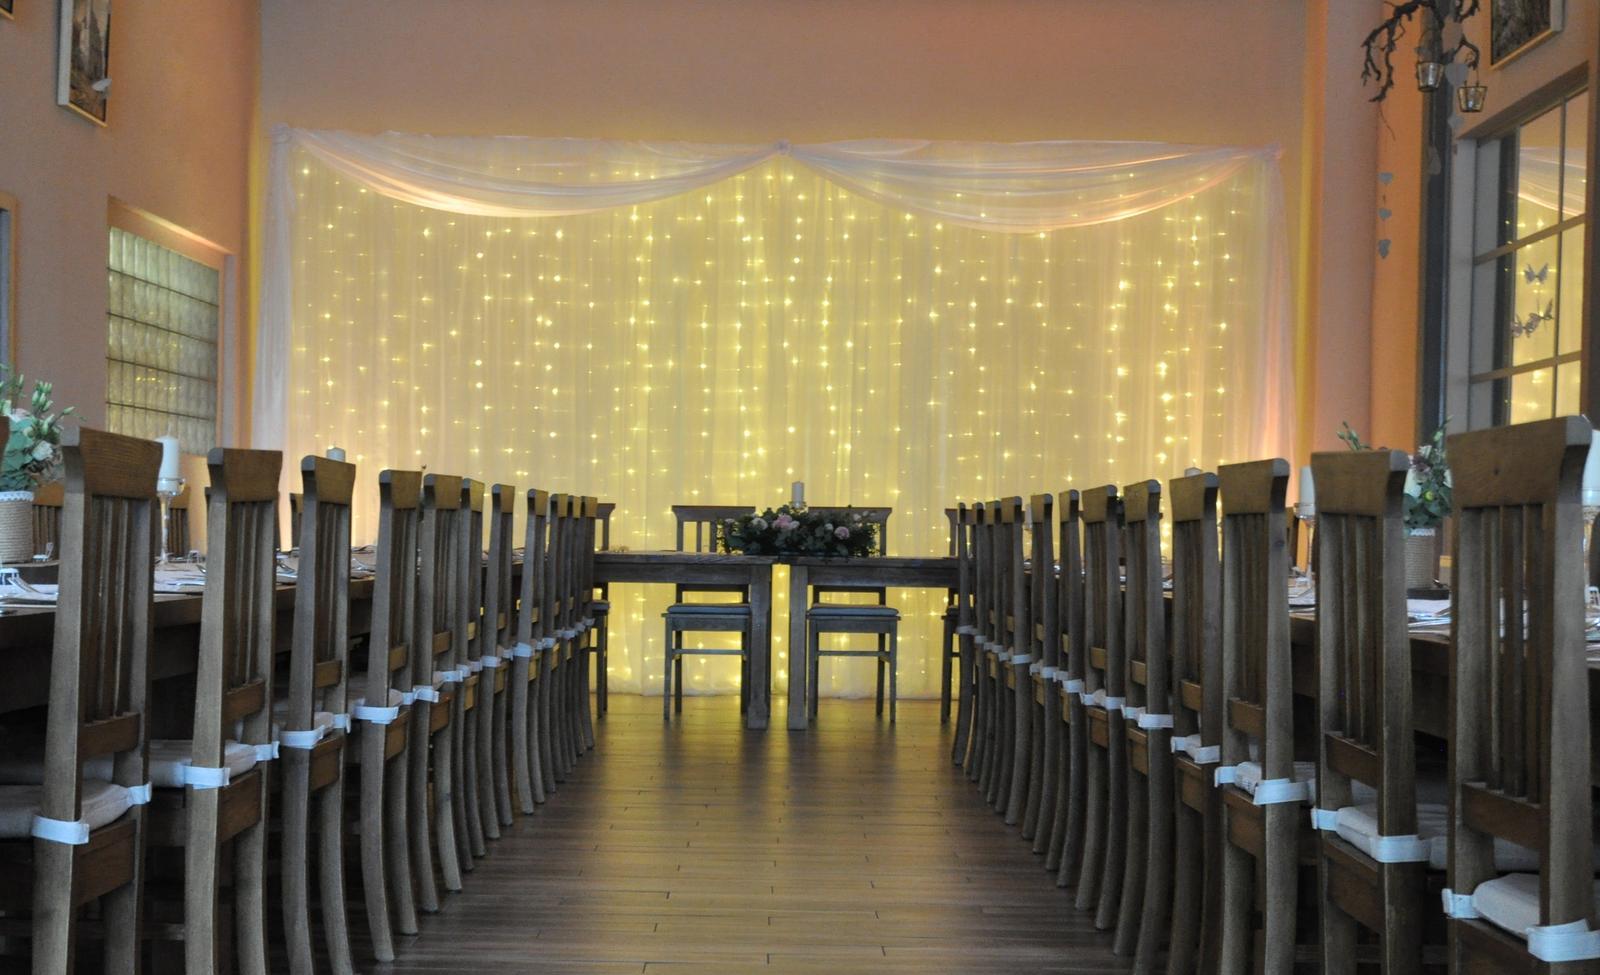 Tryskáč pub Pod.Biskupice - svetelná stena a nasvietenie sály - Obrázok č. 2